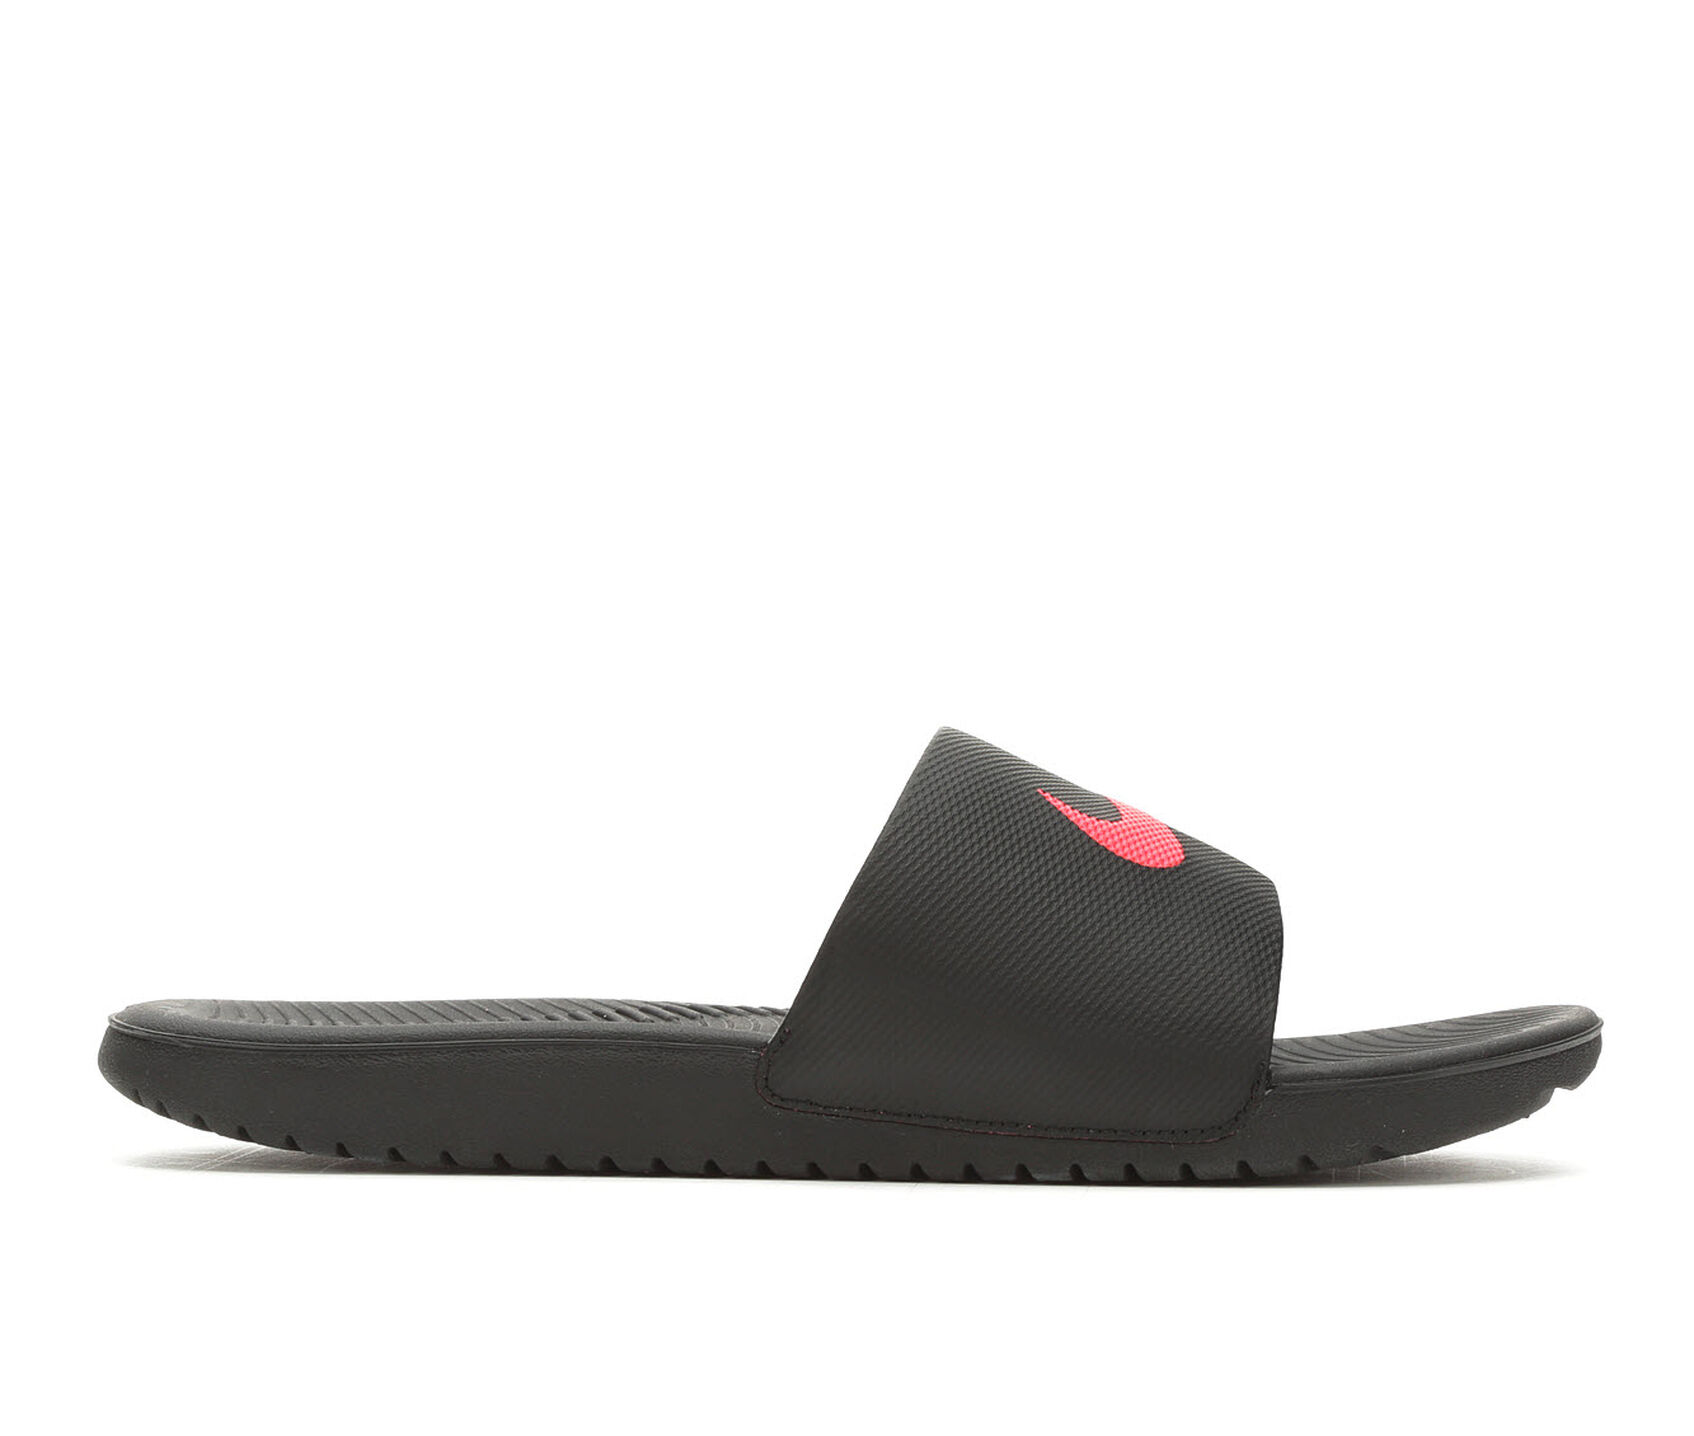 1d75c75f9 ... Nike Kawa Slide Sport Slides. Previous